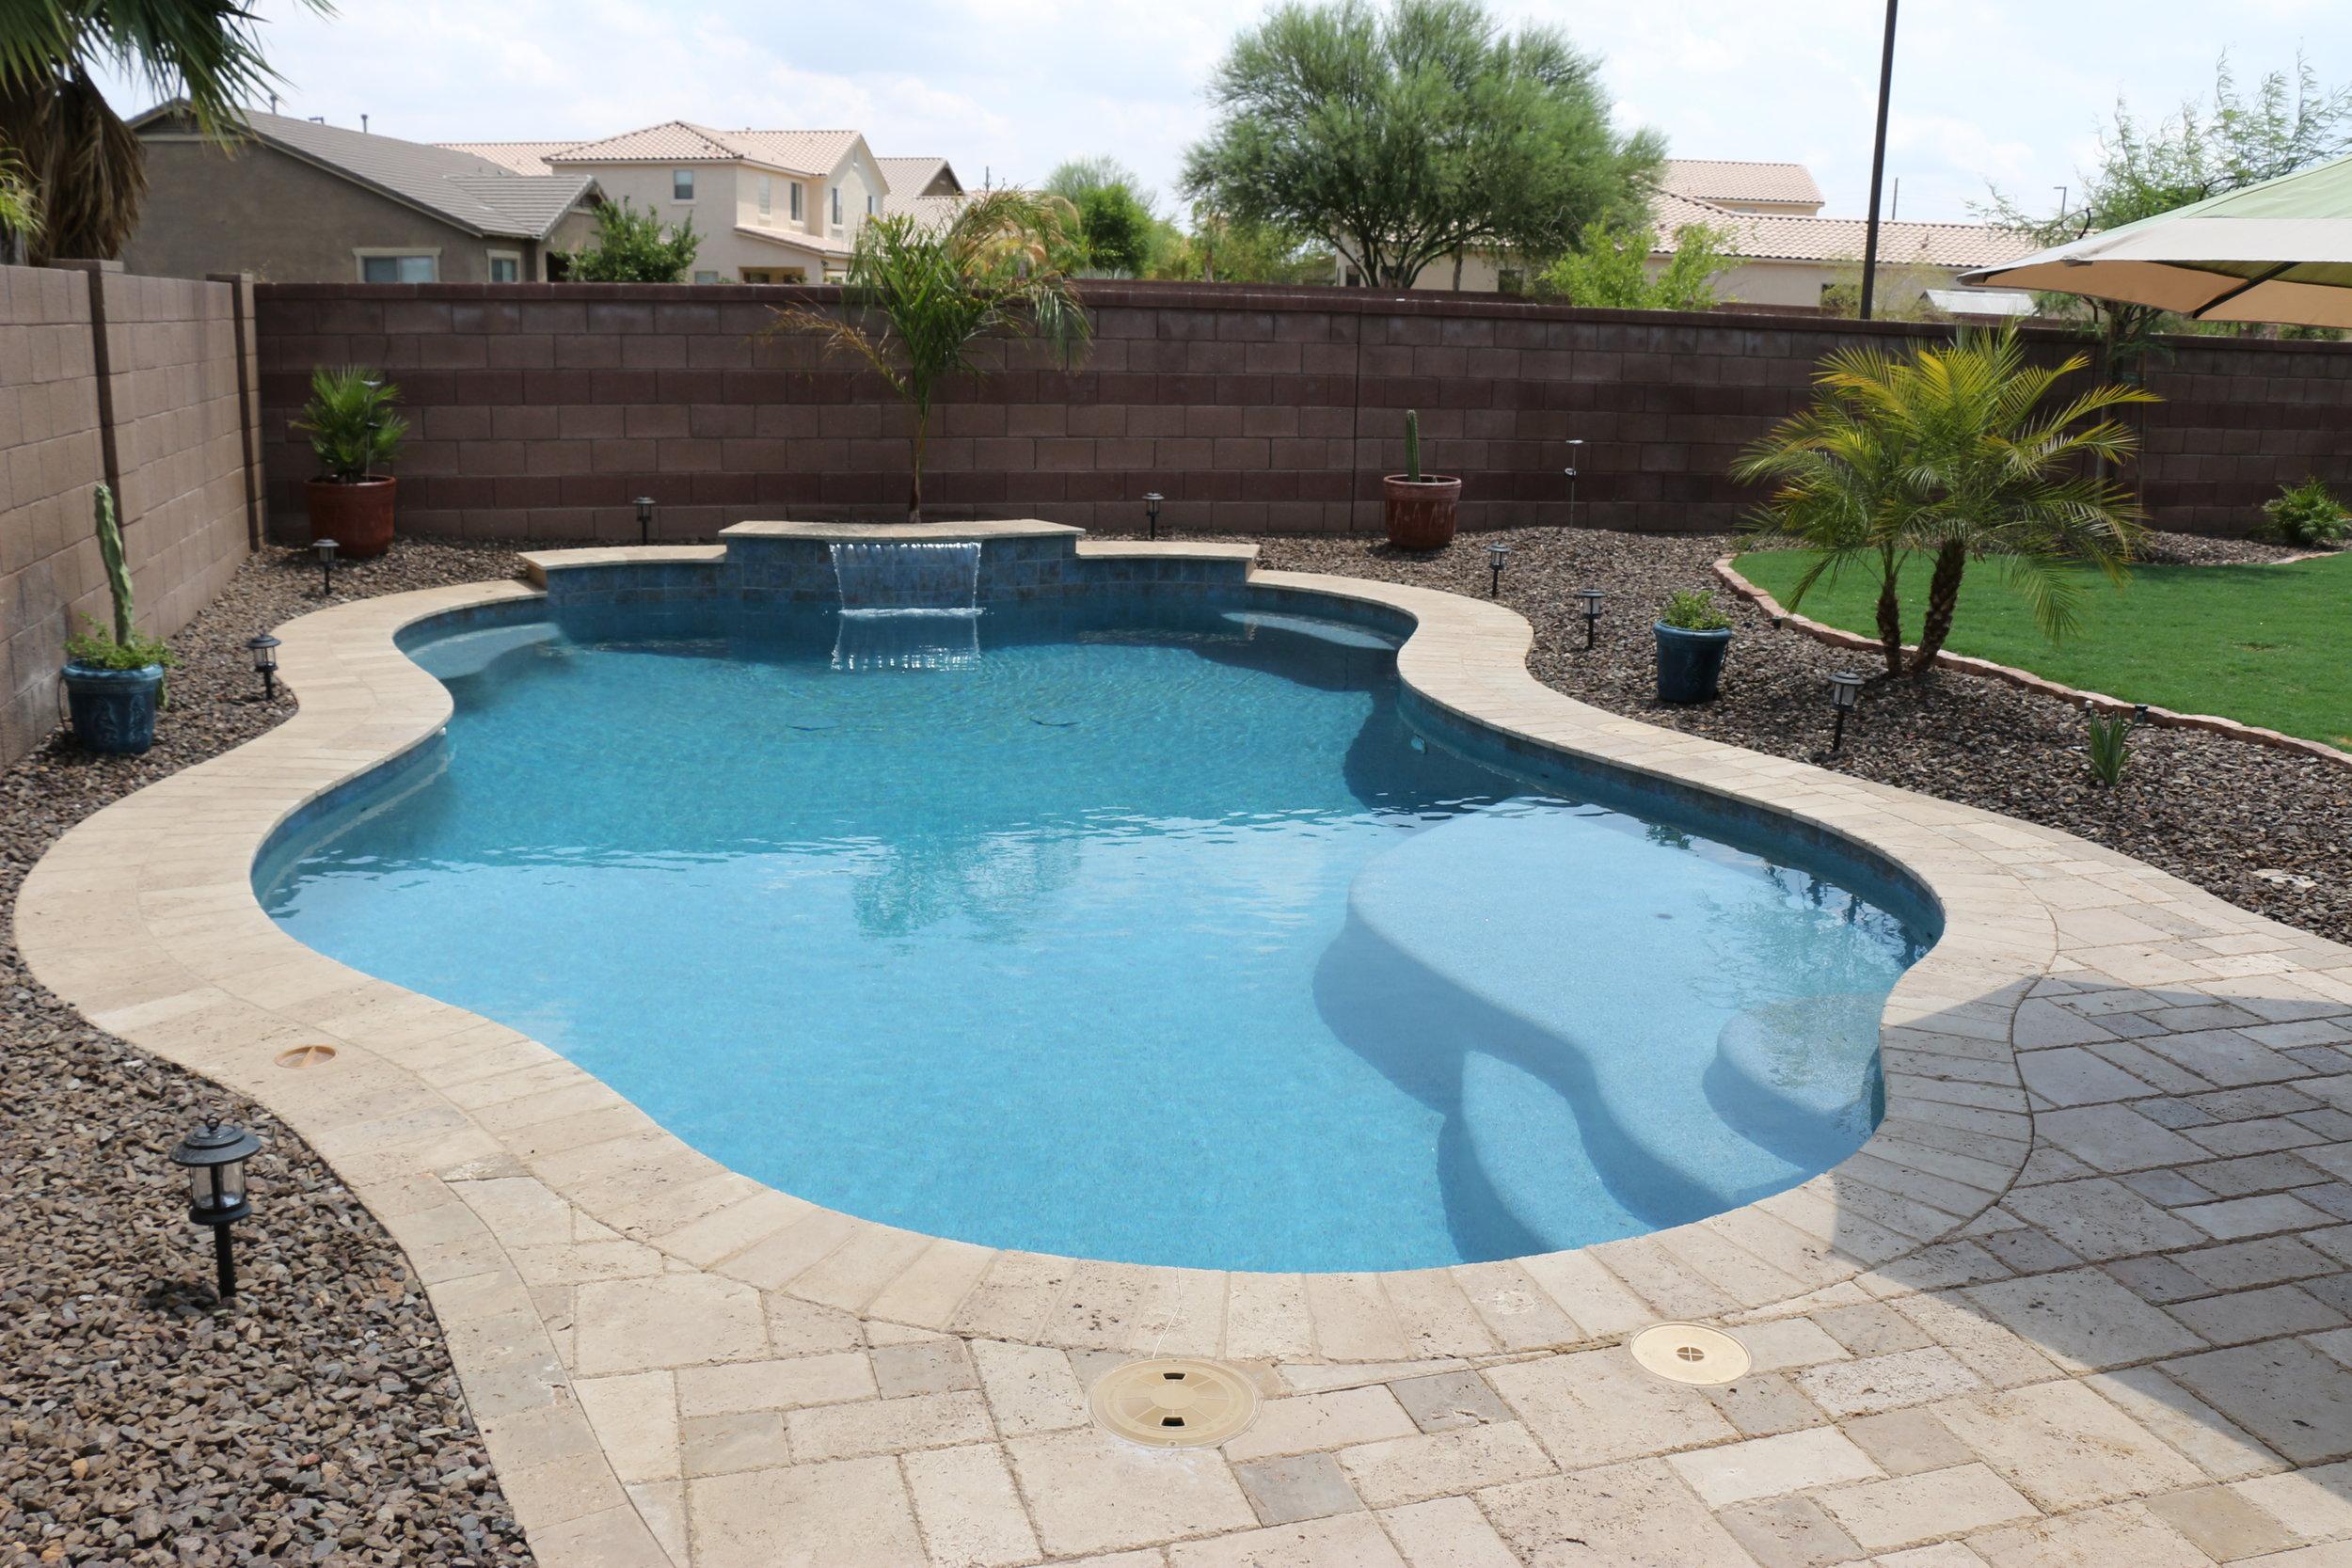 Simple Backyards — Presidential Pools, Spas & Patio of Arizona on Basic Patio Ideas id=32544